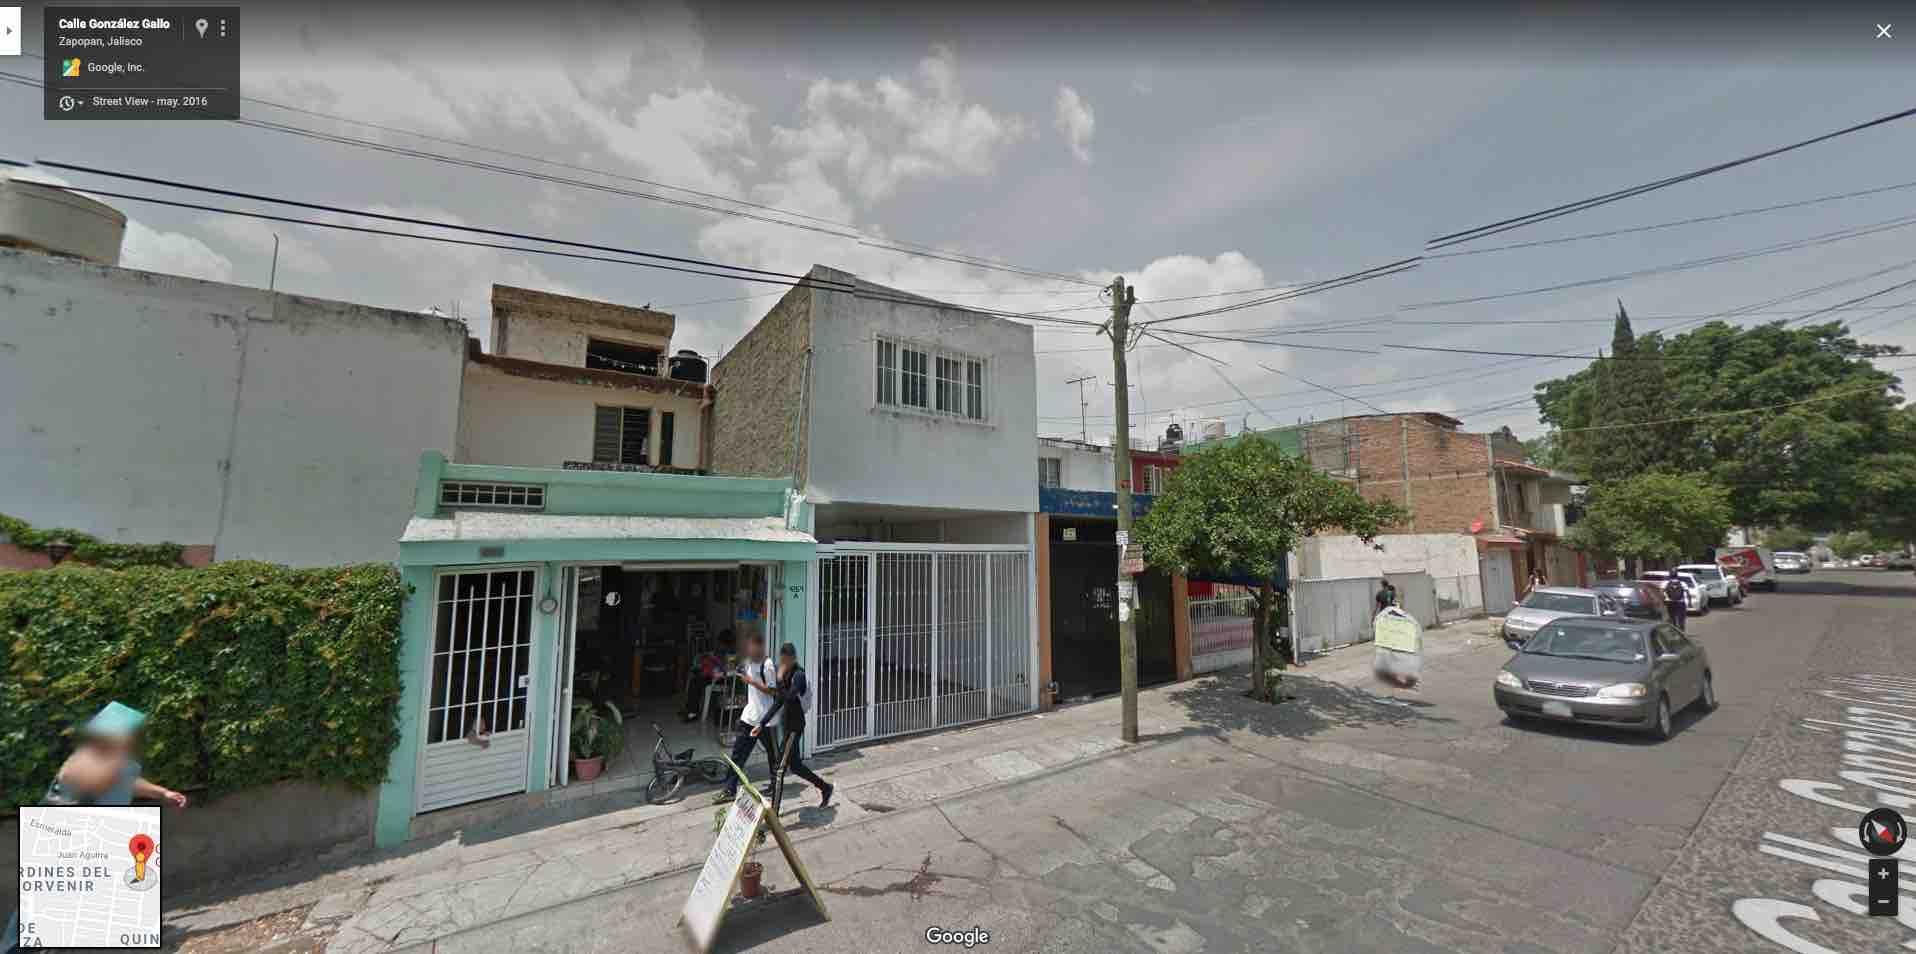 Fracc. Parques Del Auditorio, Calle Gonzalez Gallo 4260, Zapopan, Jal. C.P. 45130